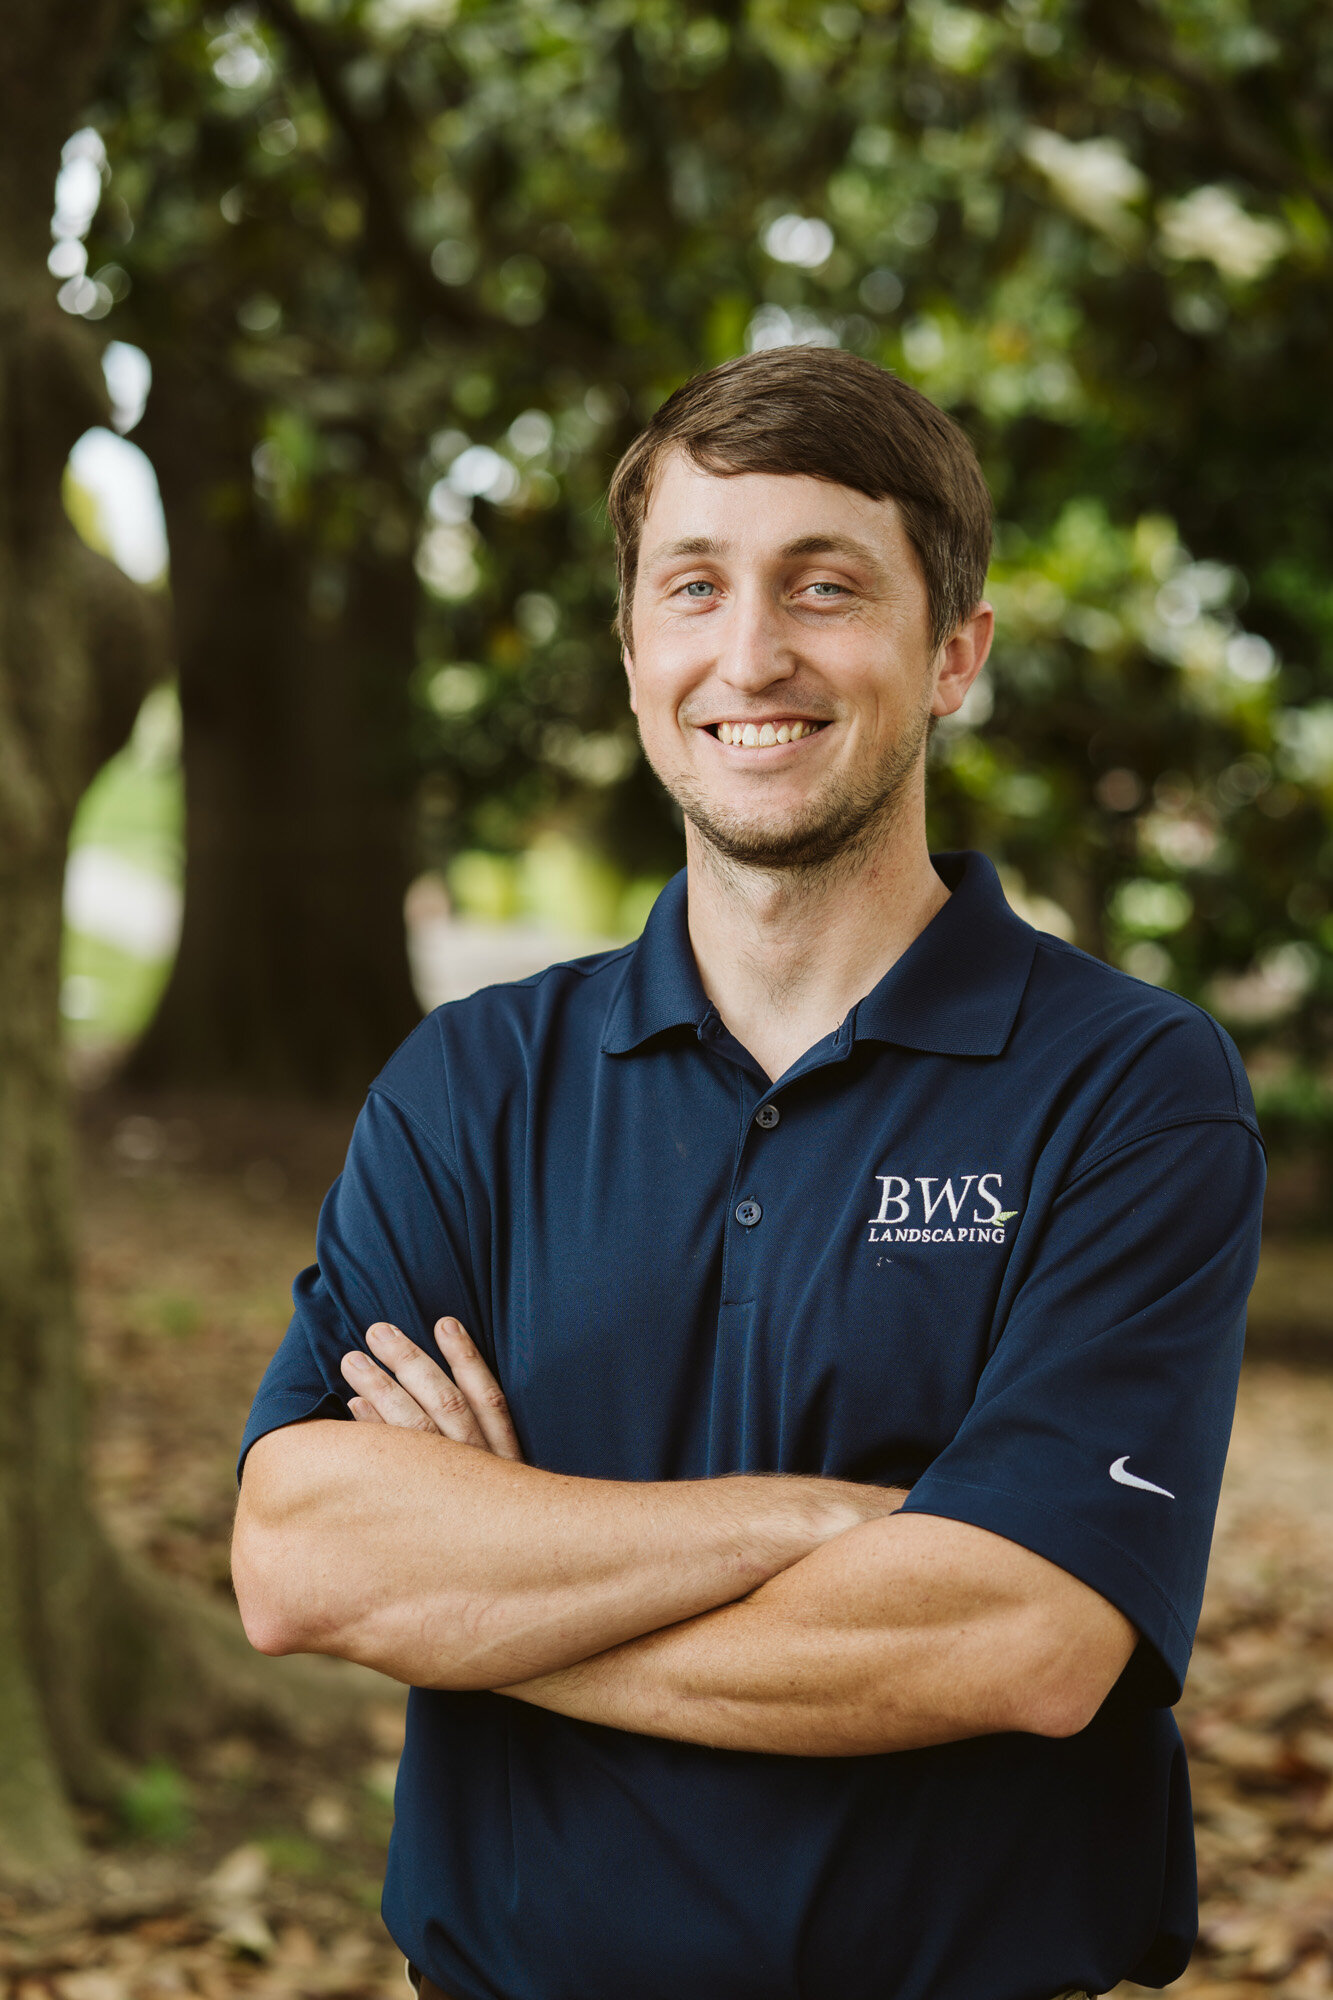 Kyle-Johnston-team-BWS-Landscaping.jpg